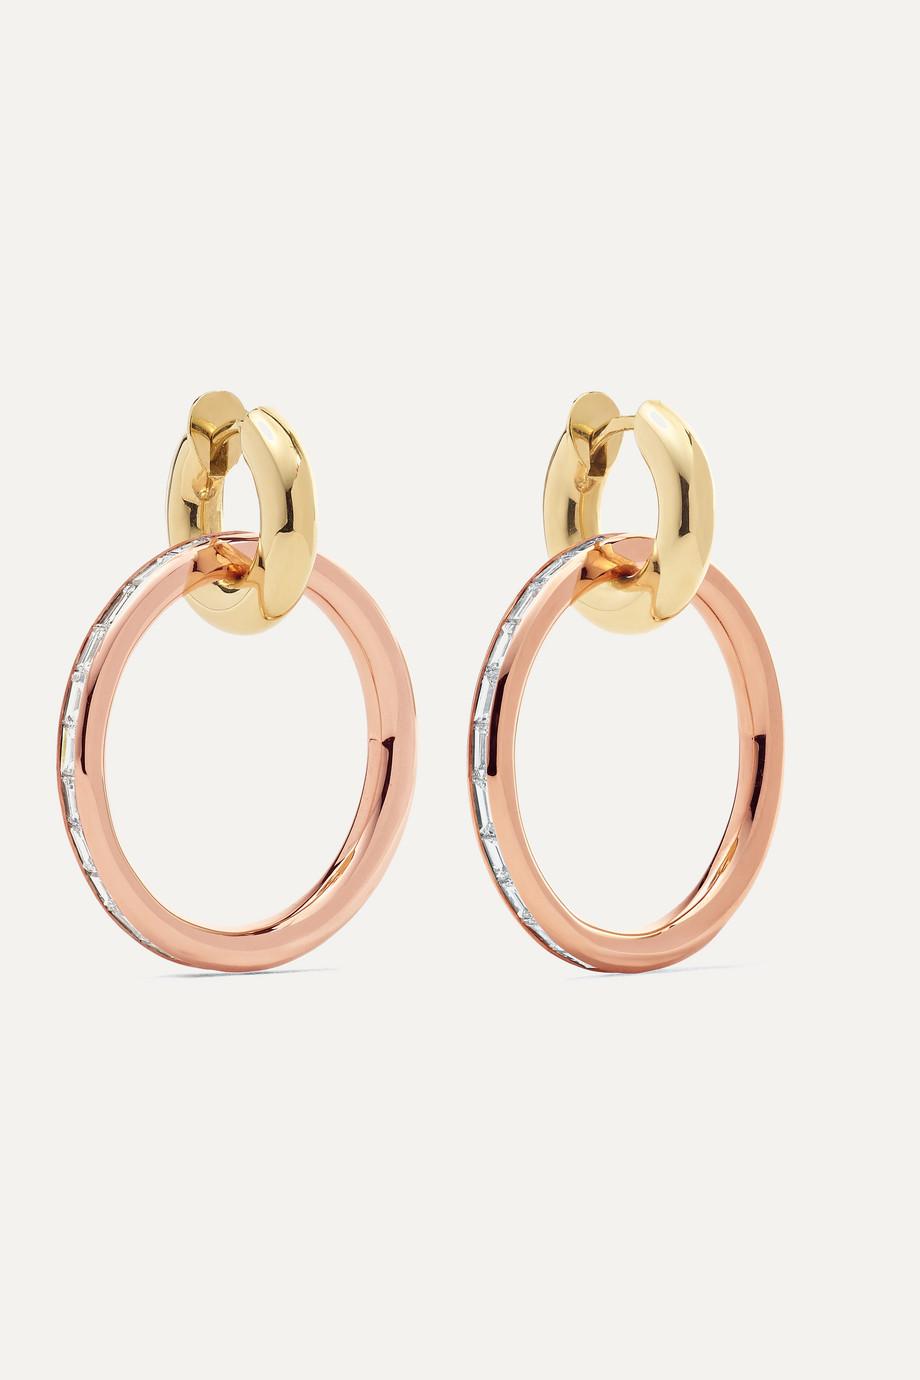 Spinelli Kilcollin Theano 18-karat rose and yellow gold diamond hoop earrings